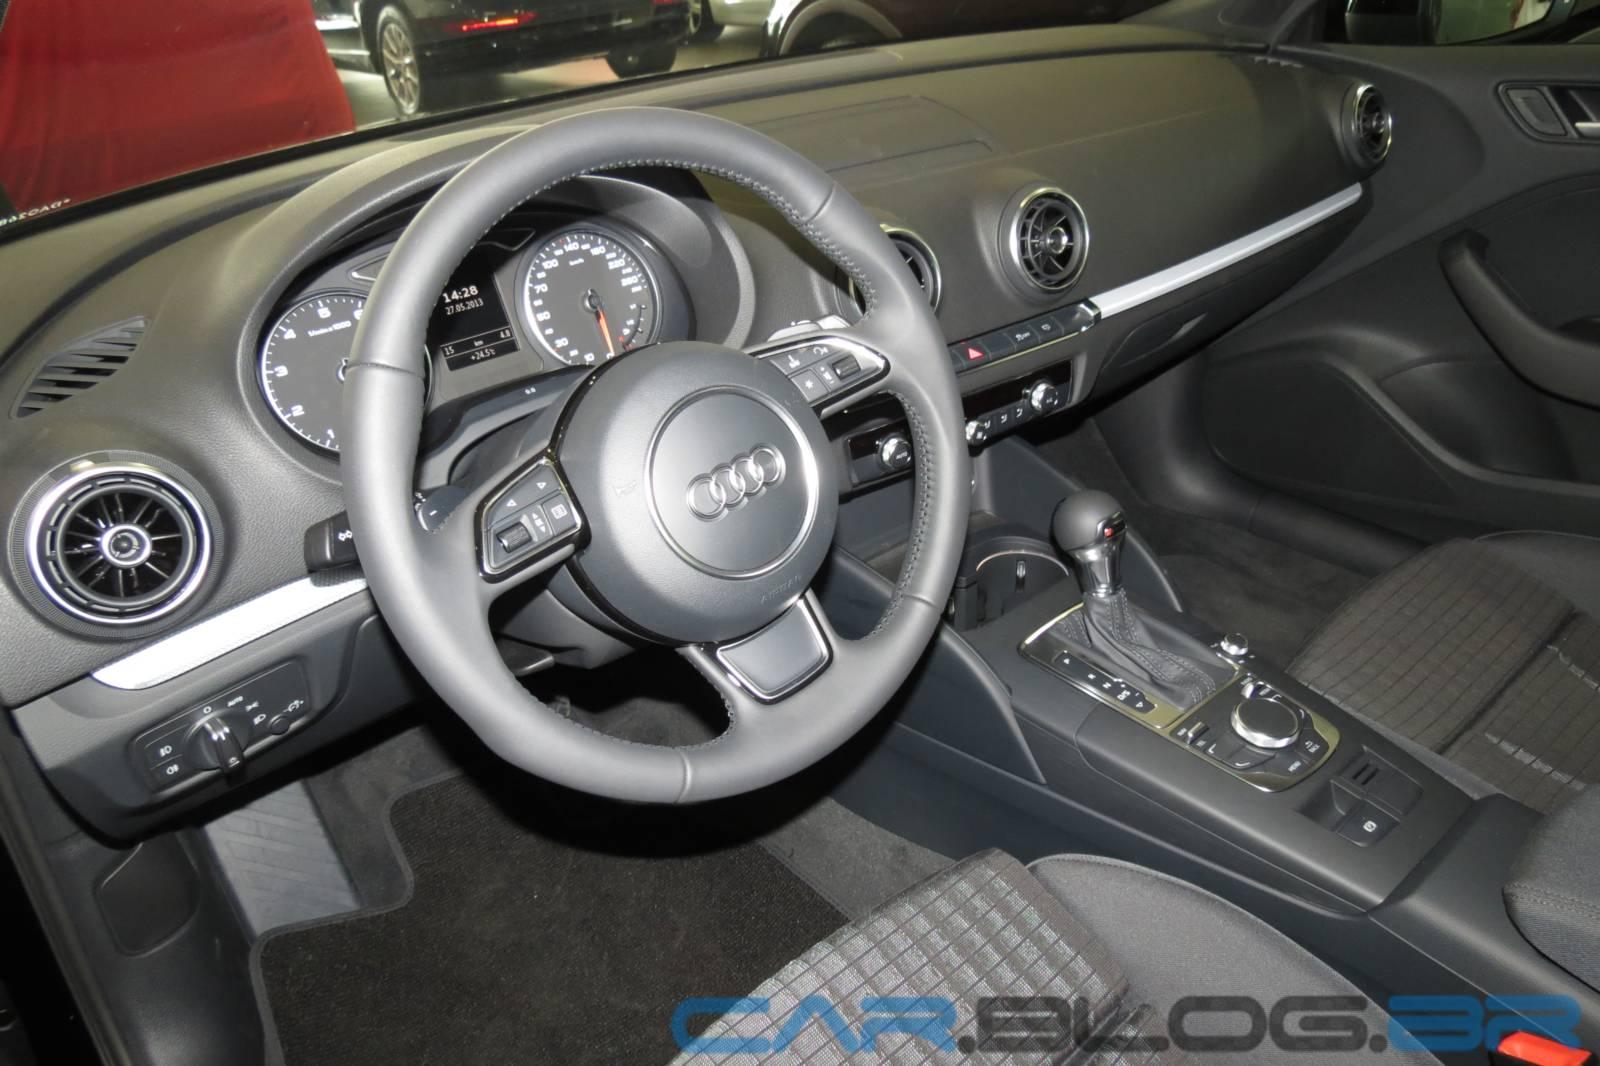 Audi A3 Sportback 1.8 Ambition 2015 - interior